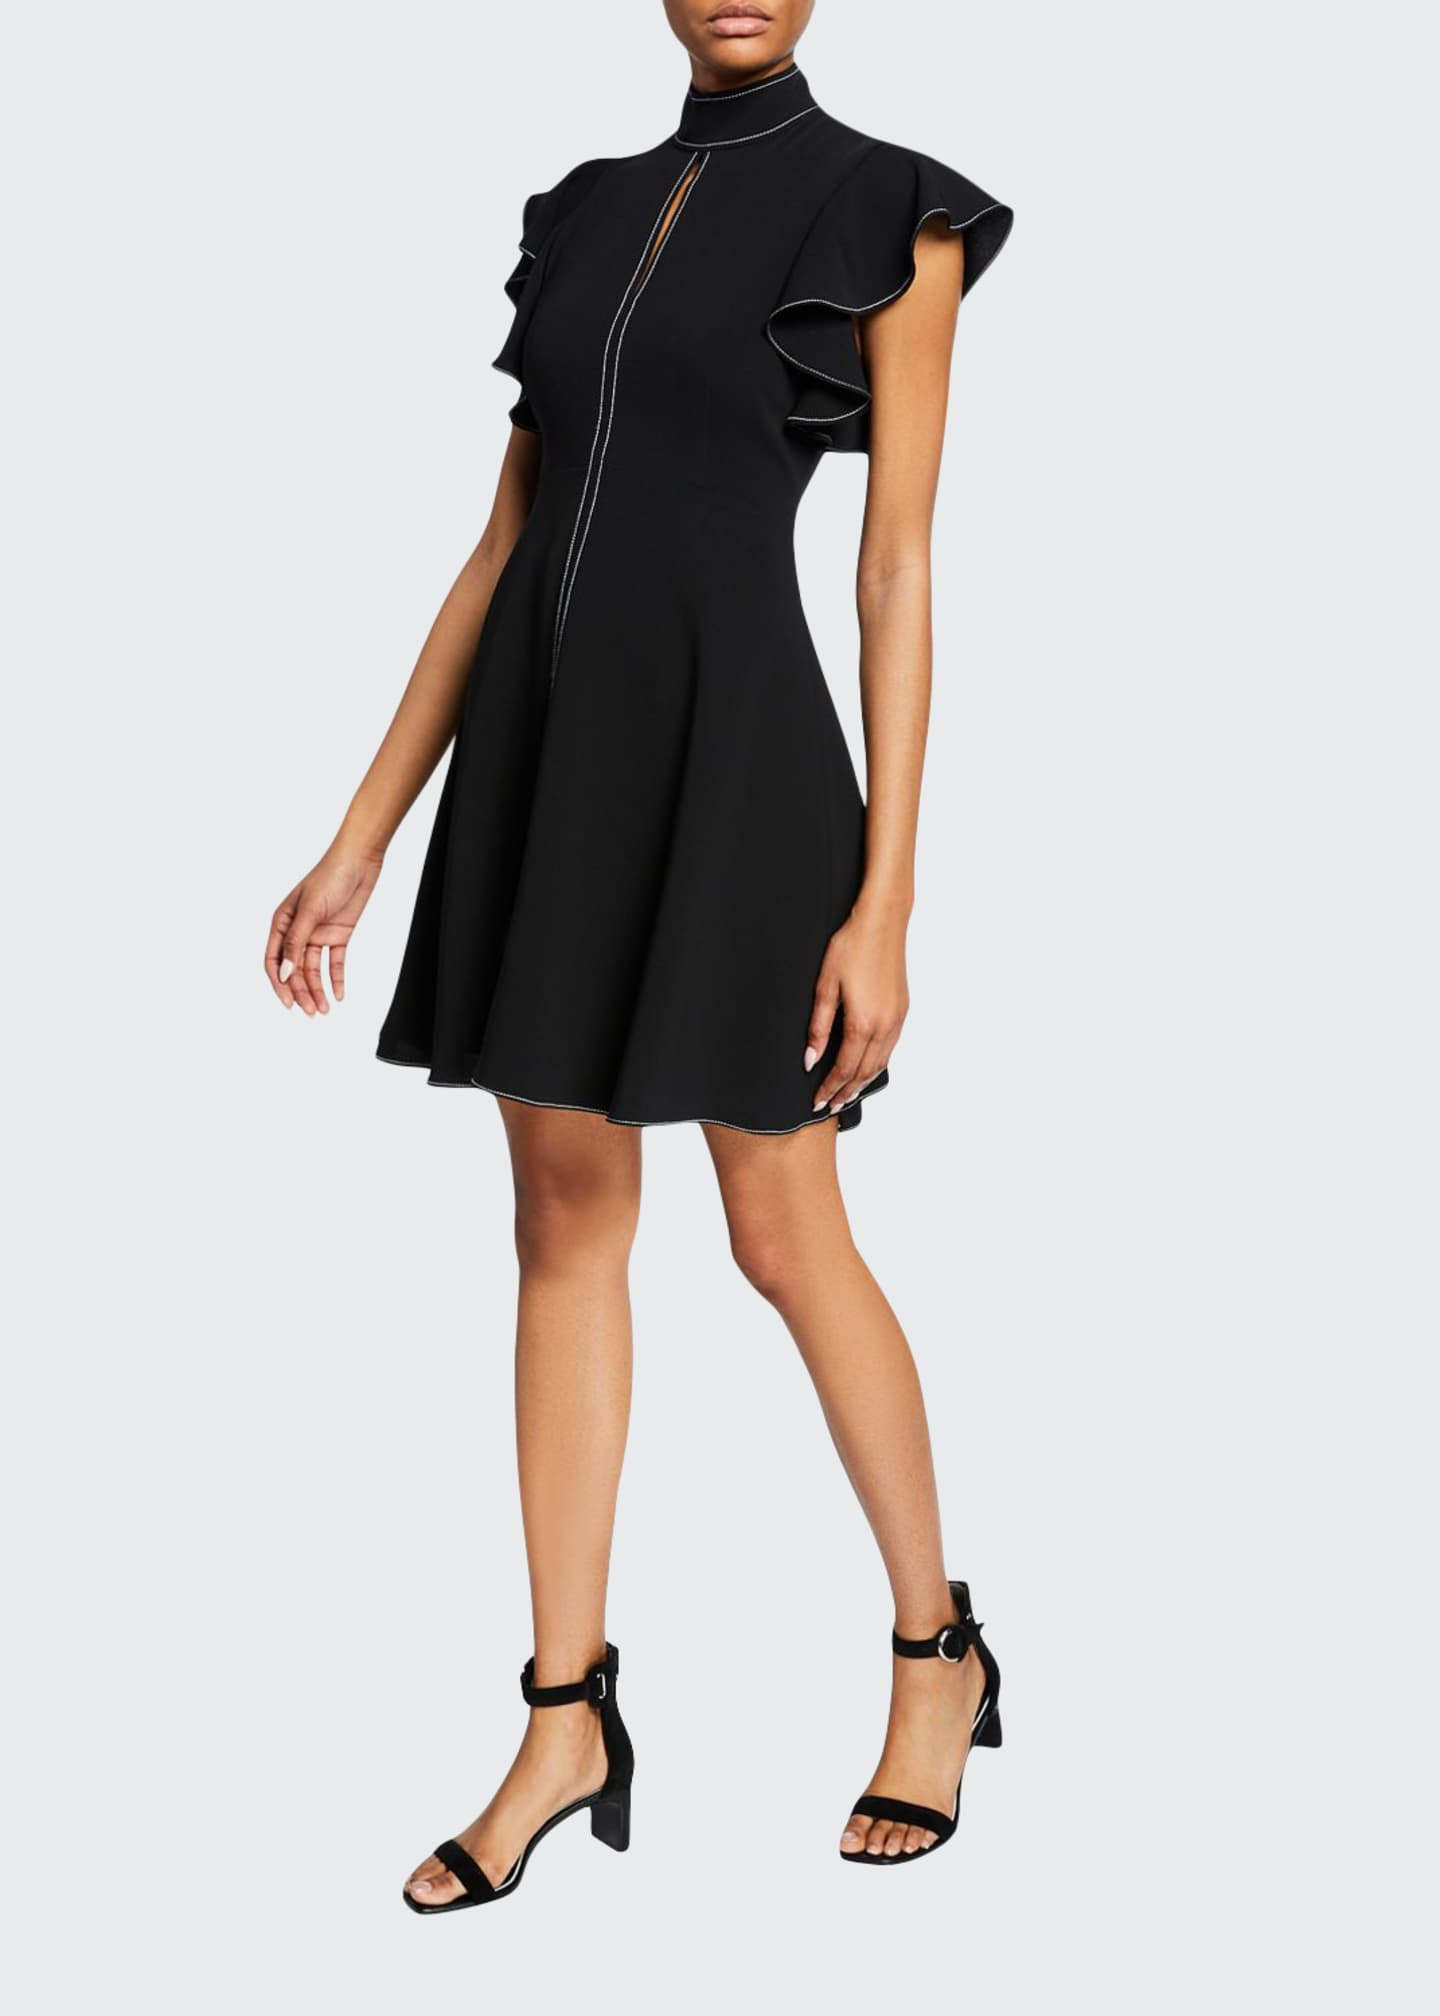 cinq a sept Reiko Turtleneck Ruffle-Sleeve Topstitch Dress